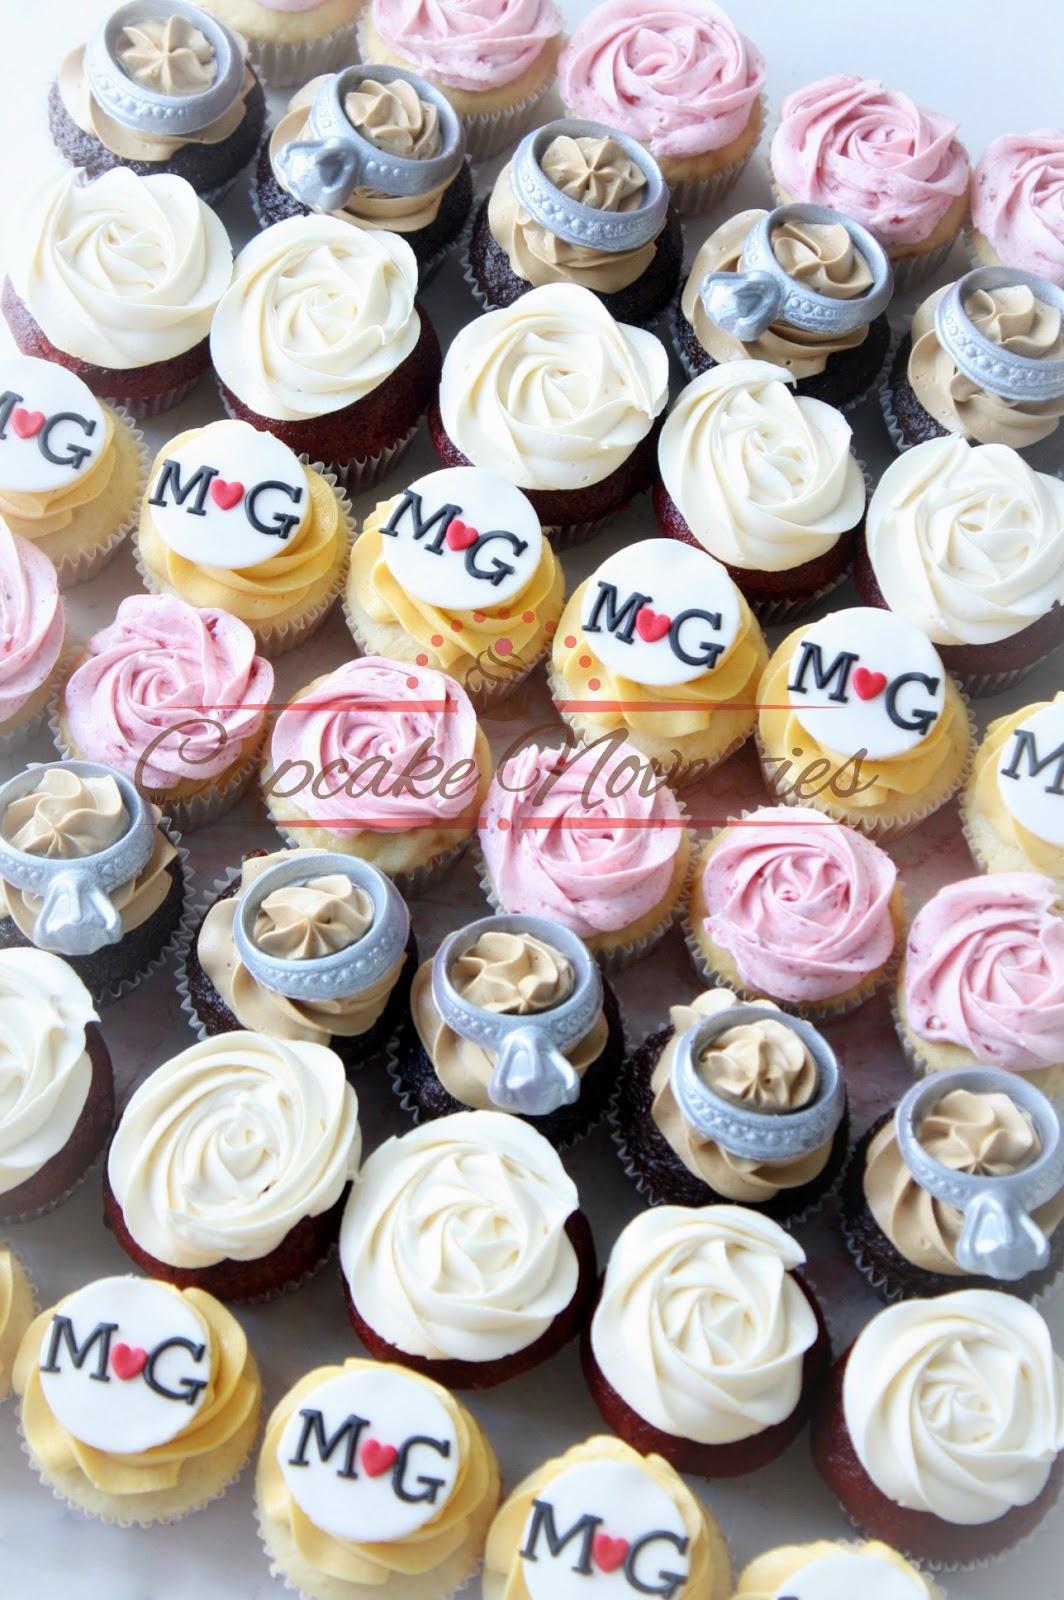 Best Red Velvet Cake In Northern Virginia